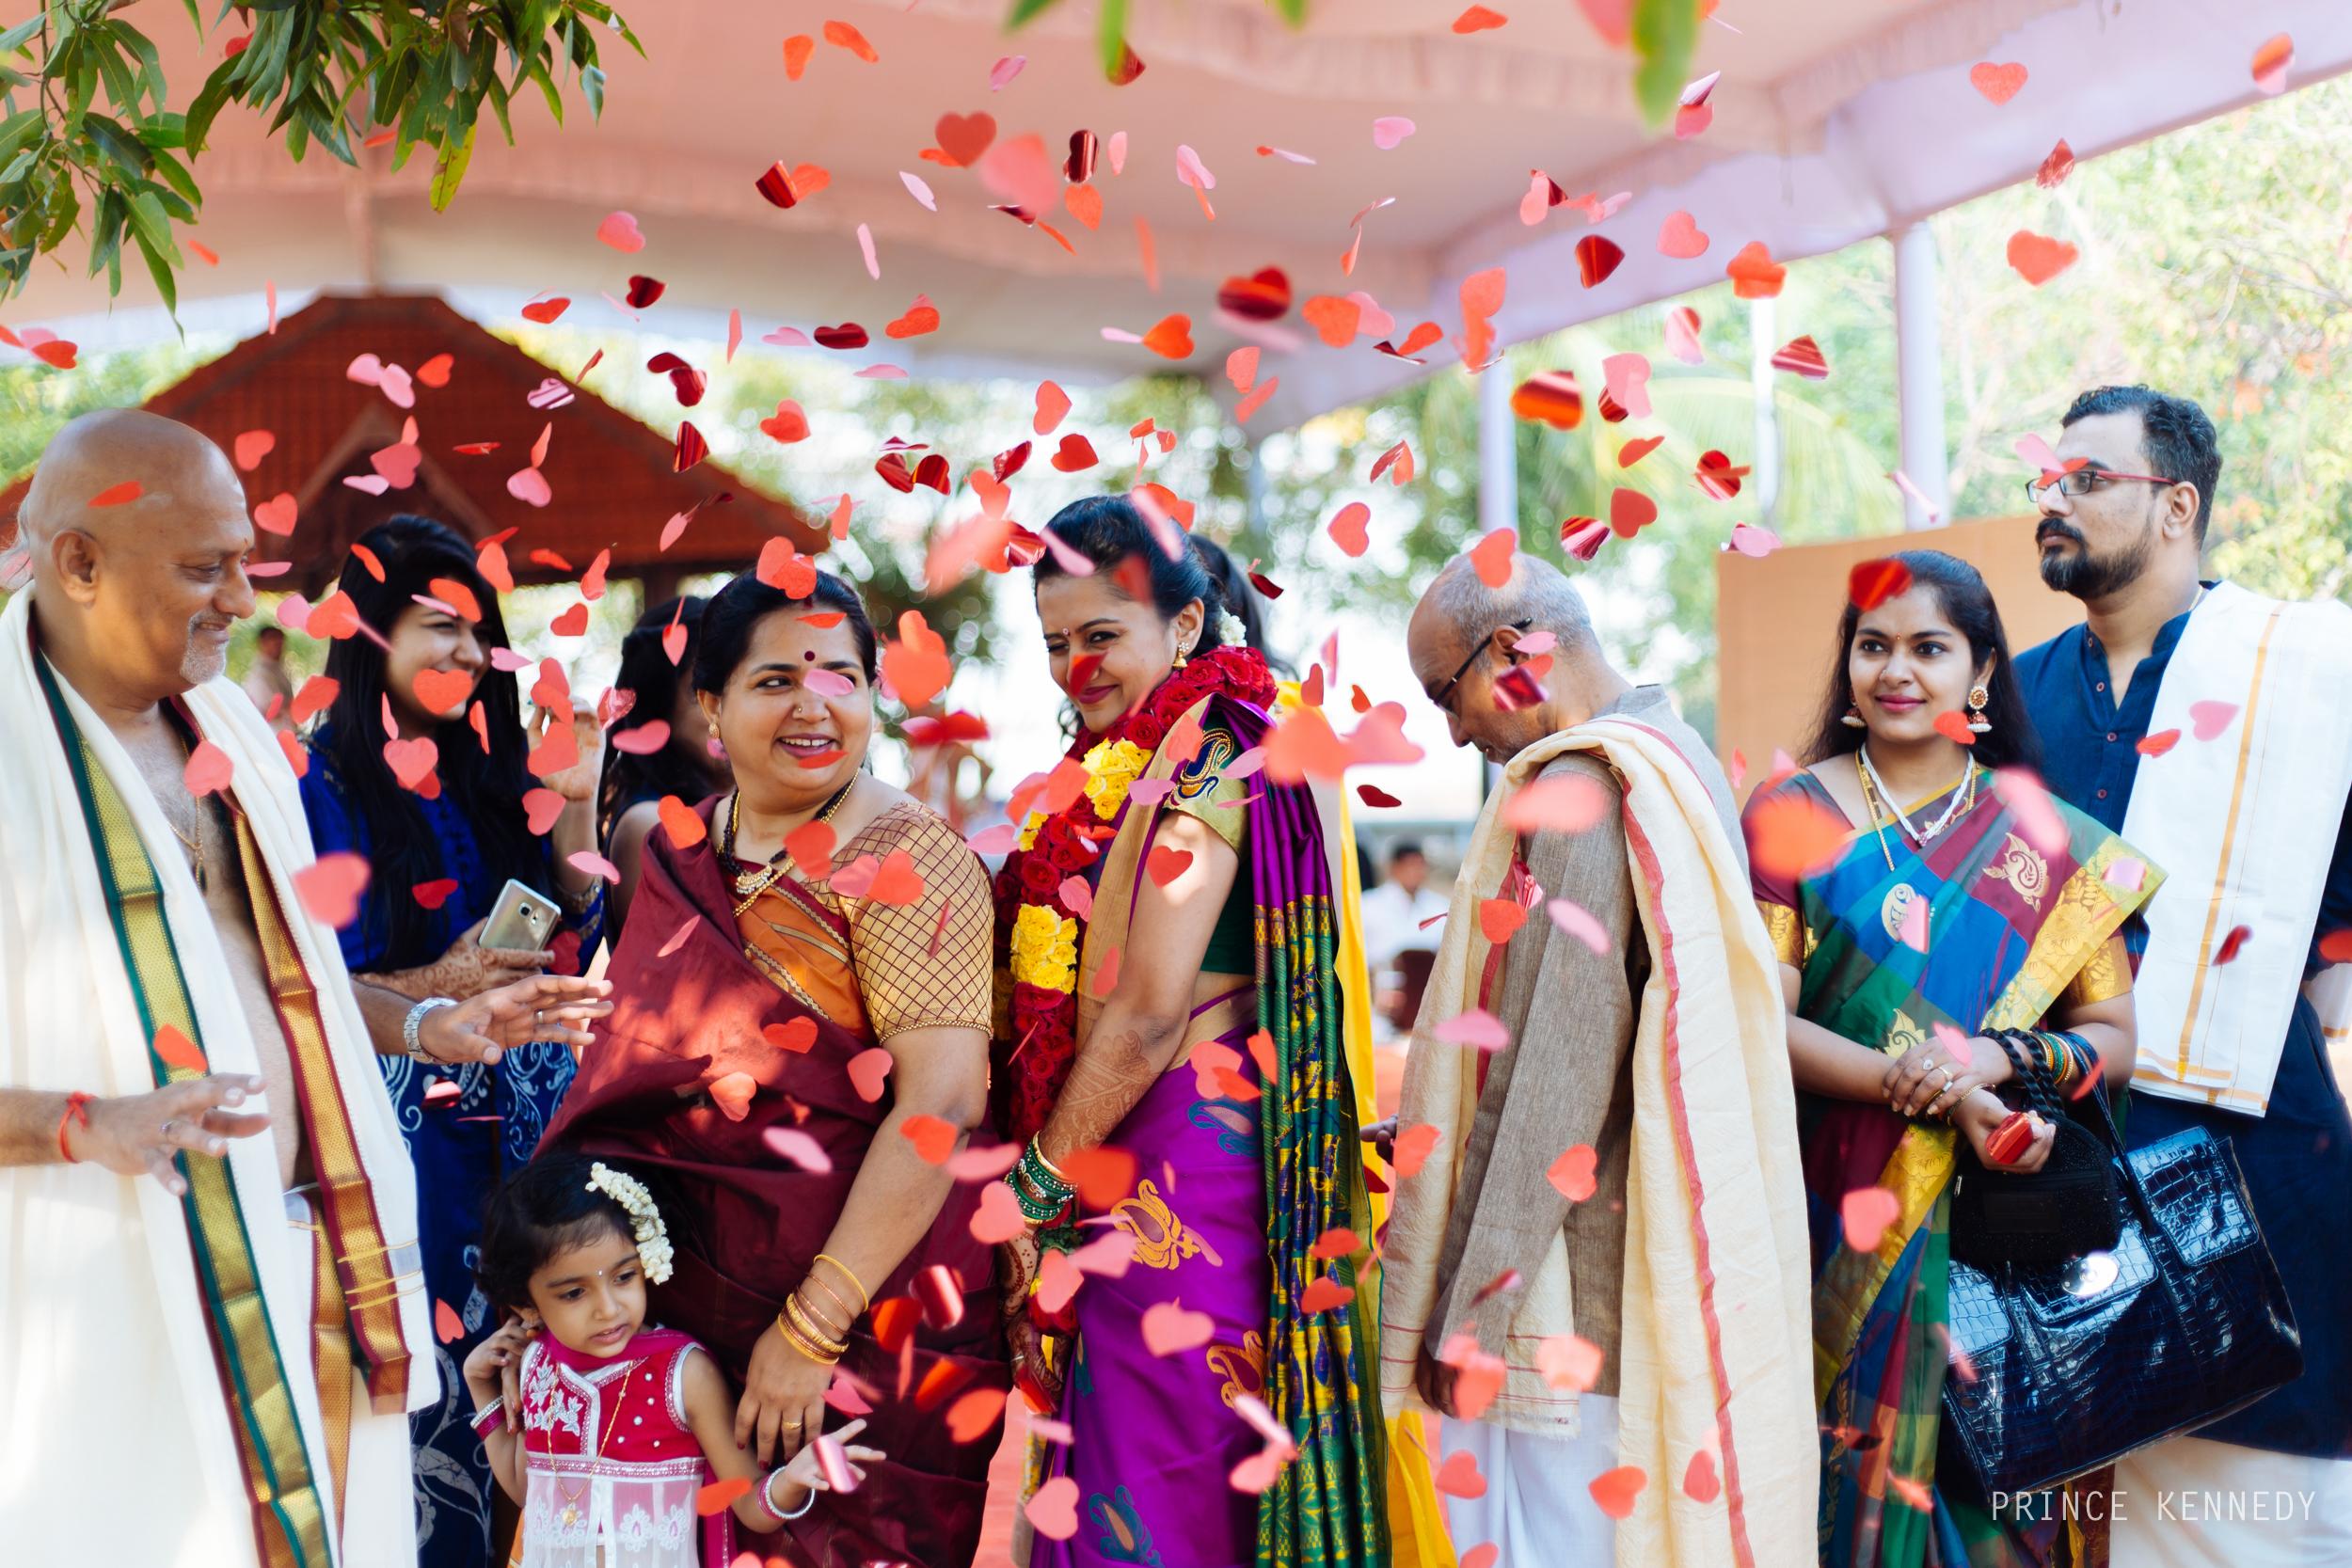 Athmajja-Nithesh-Engagement-Couple-Portrait-Portraiture-Wedding-Couple-Portrait-Chennai-Photographer-Candid-Photography-Destination-Best-Prince-Kennedy-Photography-48.jpg